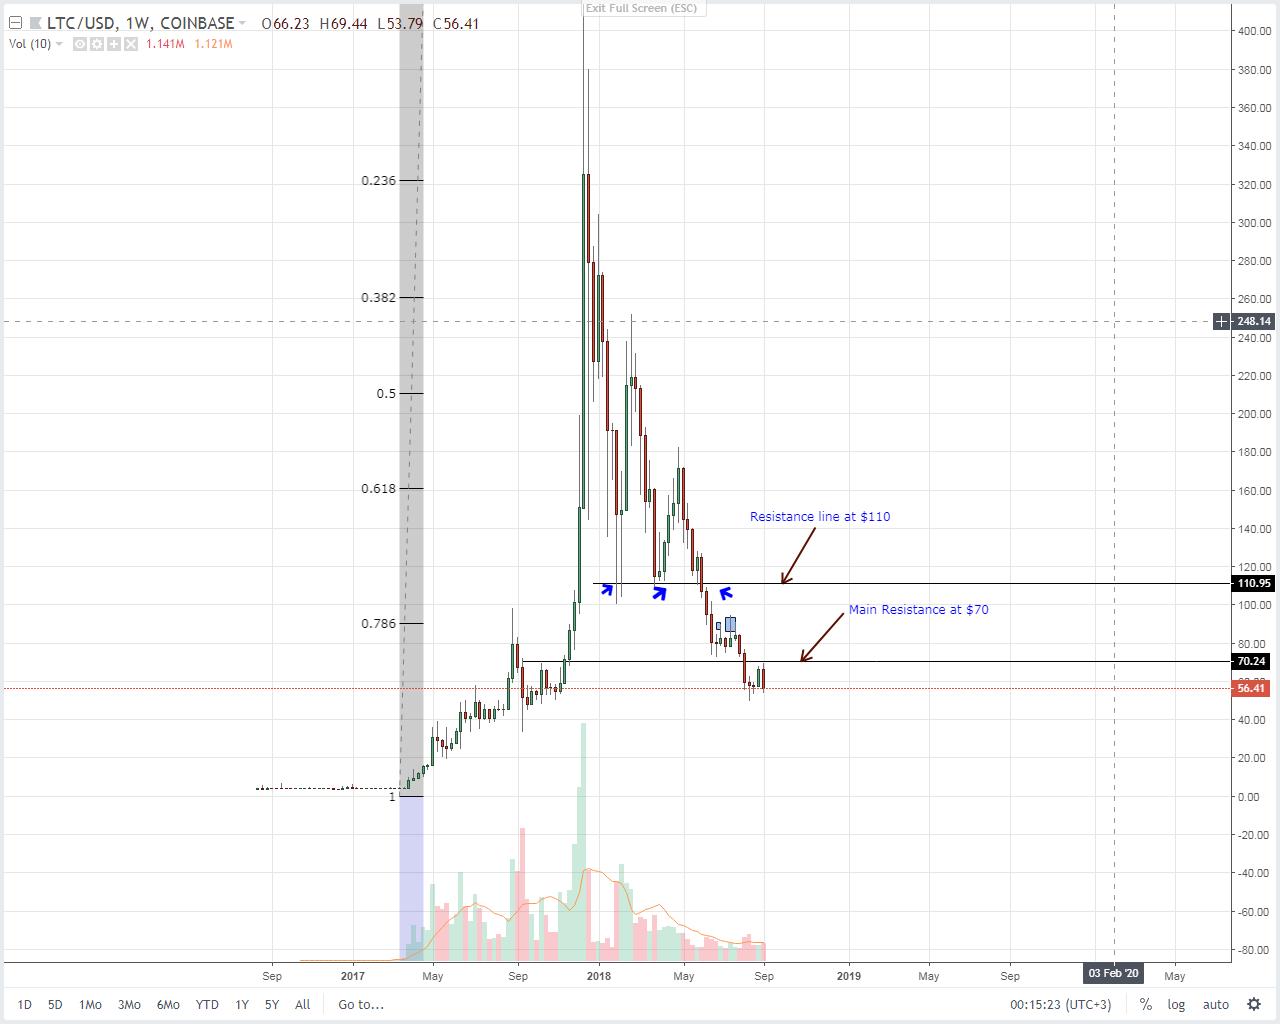 Litecoin Weekly Chart Sep 81